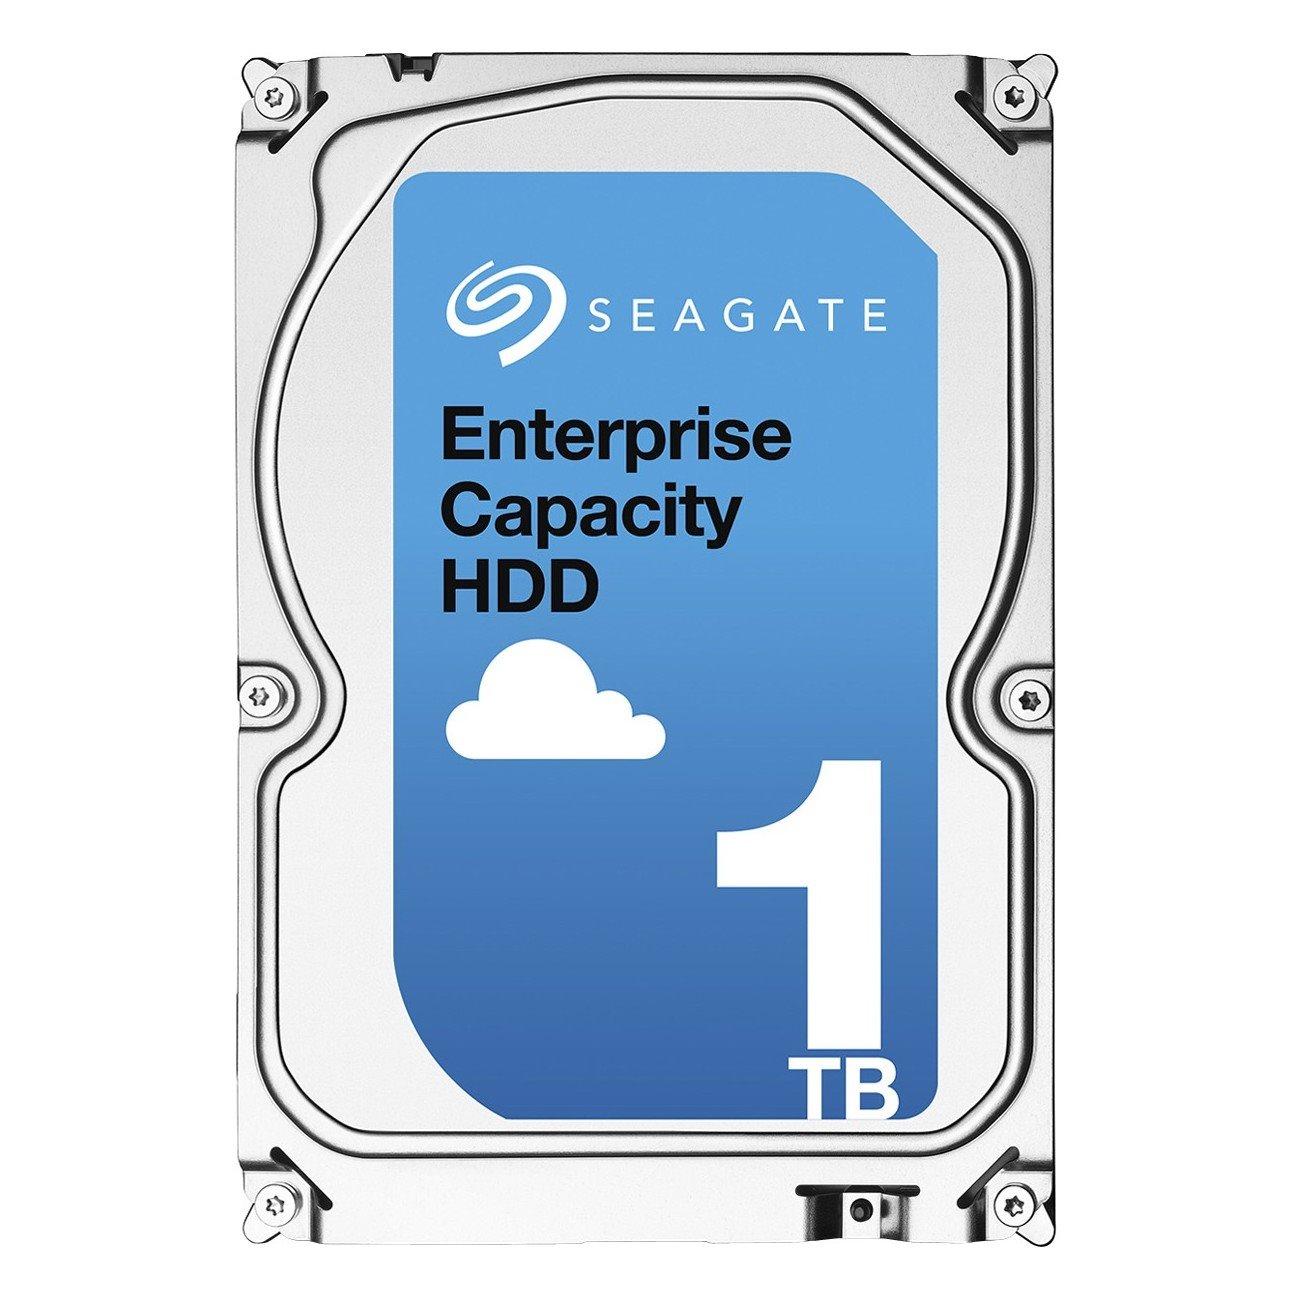 "Seagate 1 TB Hard Drive - SAS - 3.5"" Drive - Internal"